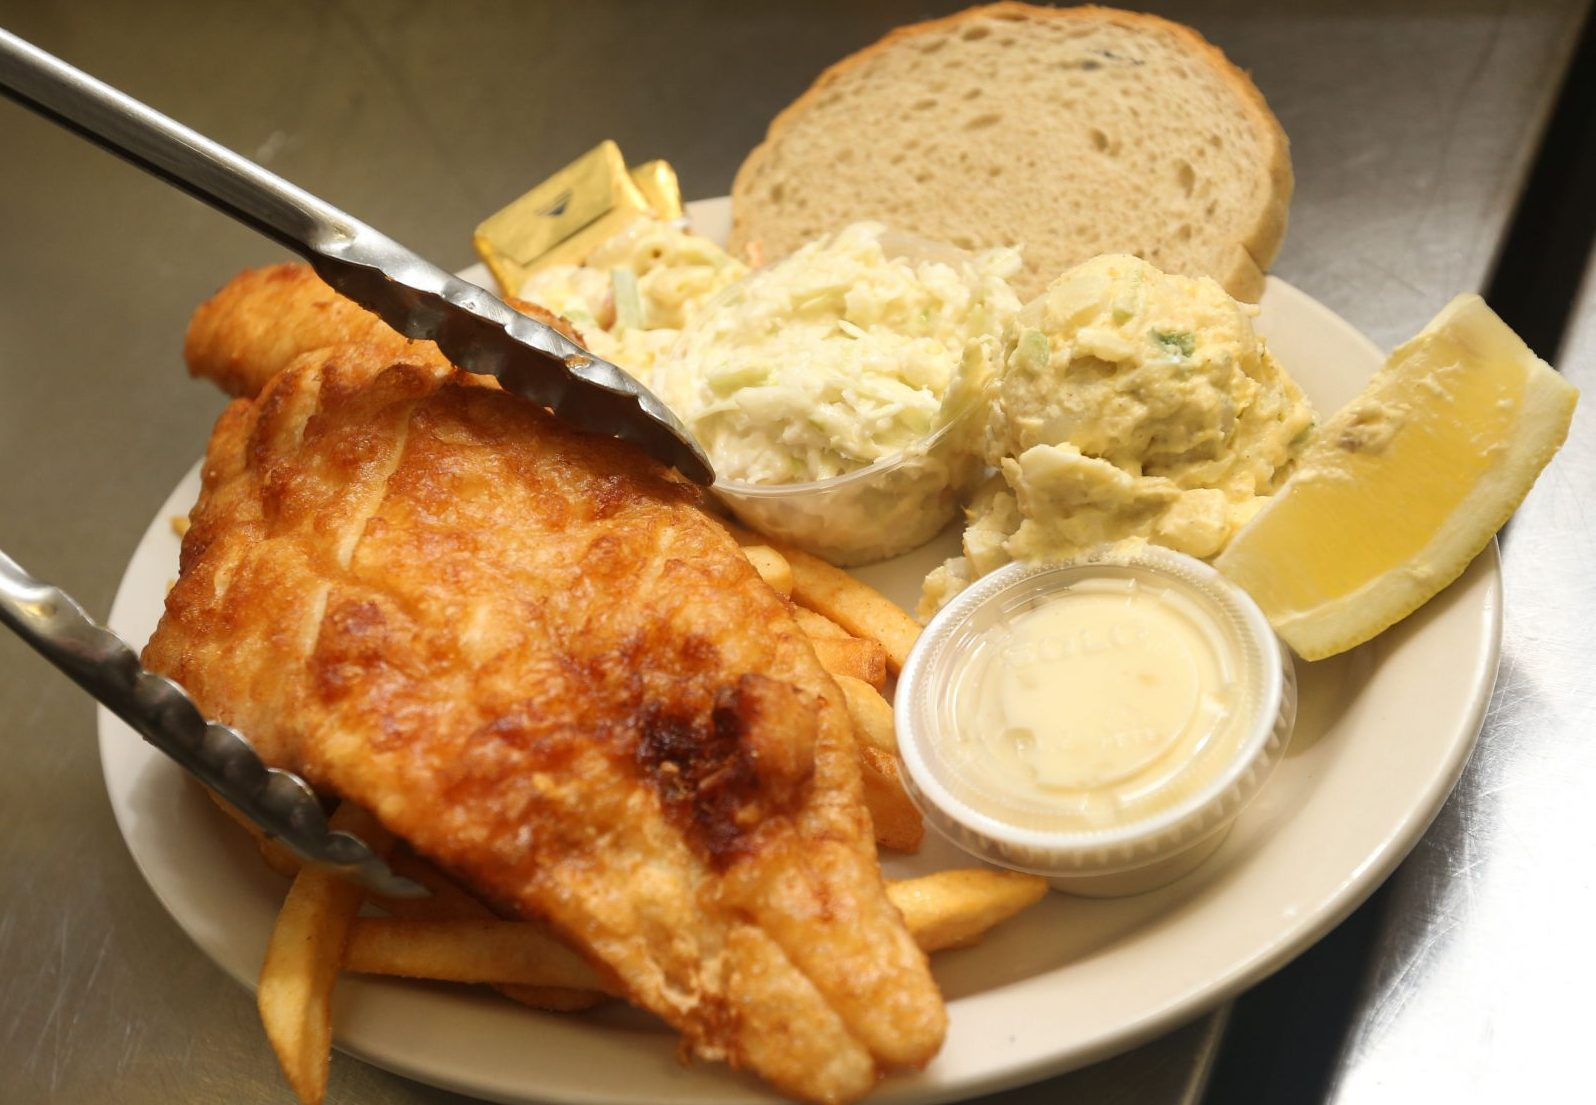 It's fish fry season in Buffalo. The Buffalo Irish Center in South Buffalo begins its fish fry at 4 p.m. on Fridays. (Sharon Cantillon/Buffalo News)